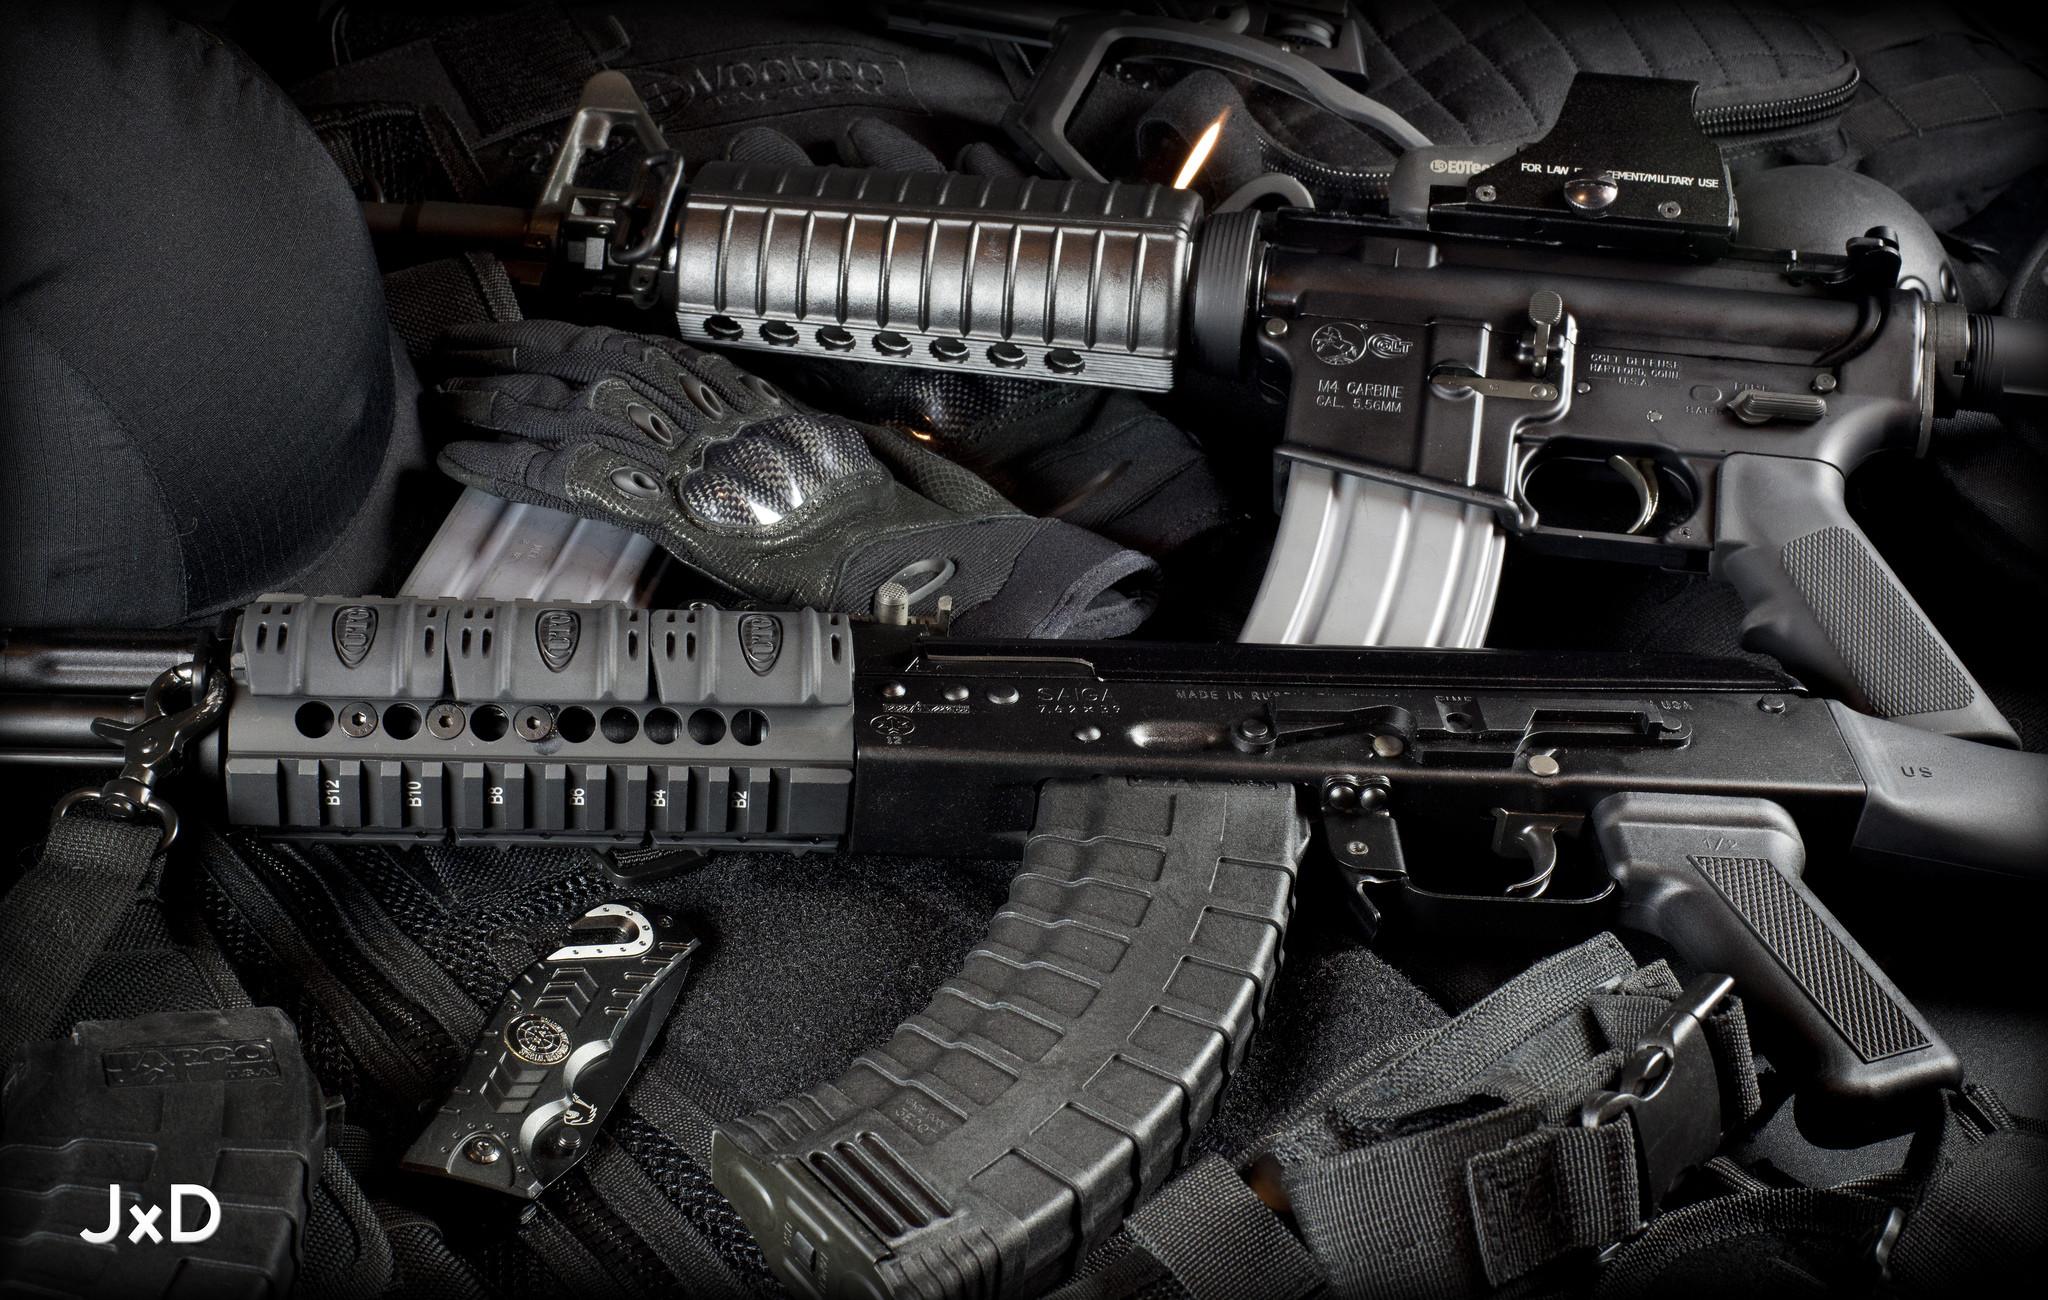 Glock 23 Gen 4 Wallpaper Photoshoot – glock talk